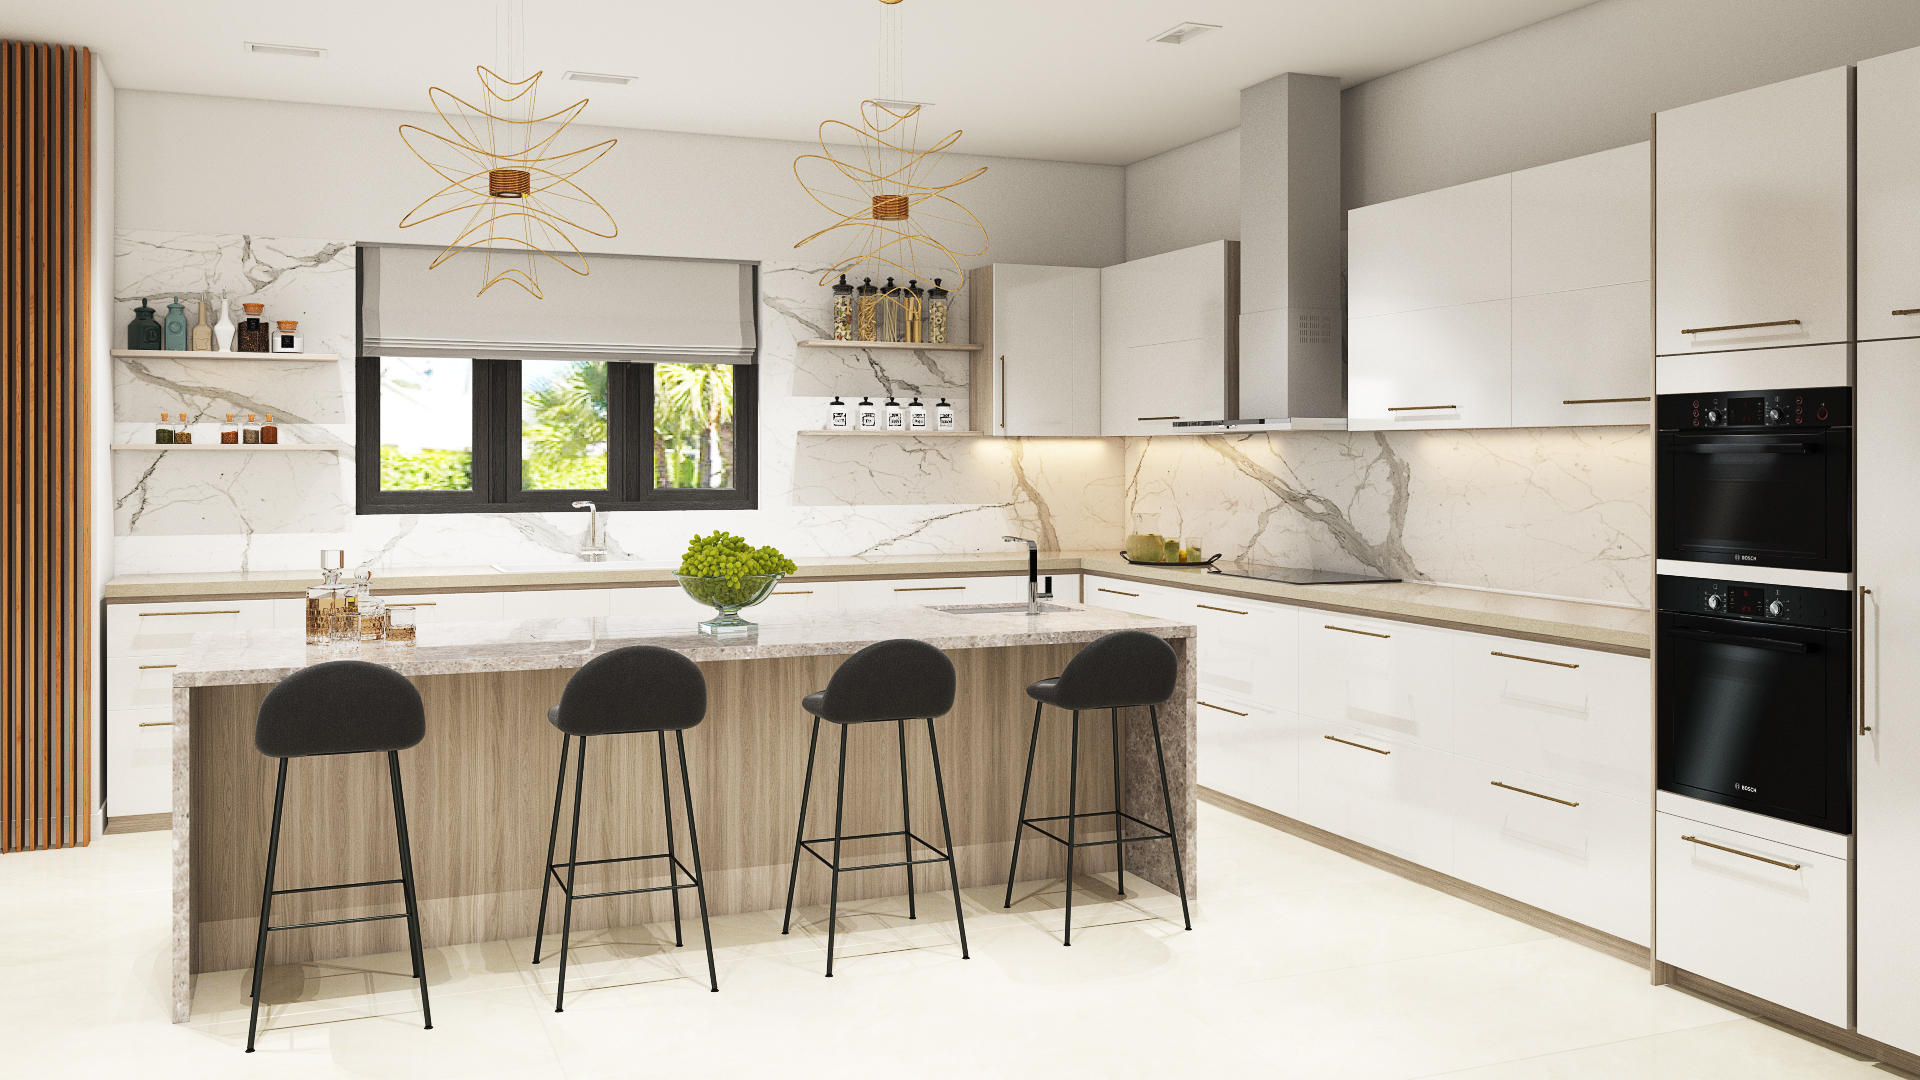 WestwoodHom622_630_630Westwood_kitchen_d